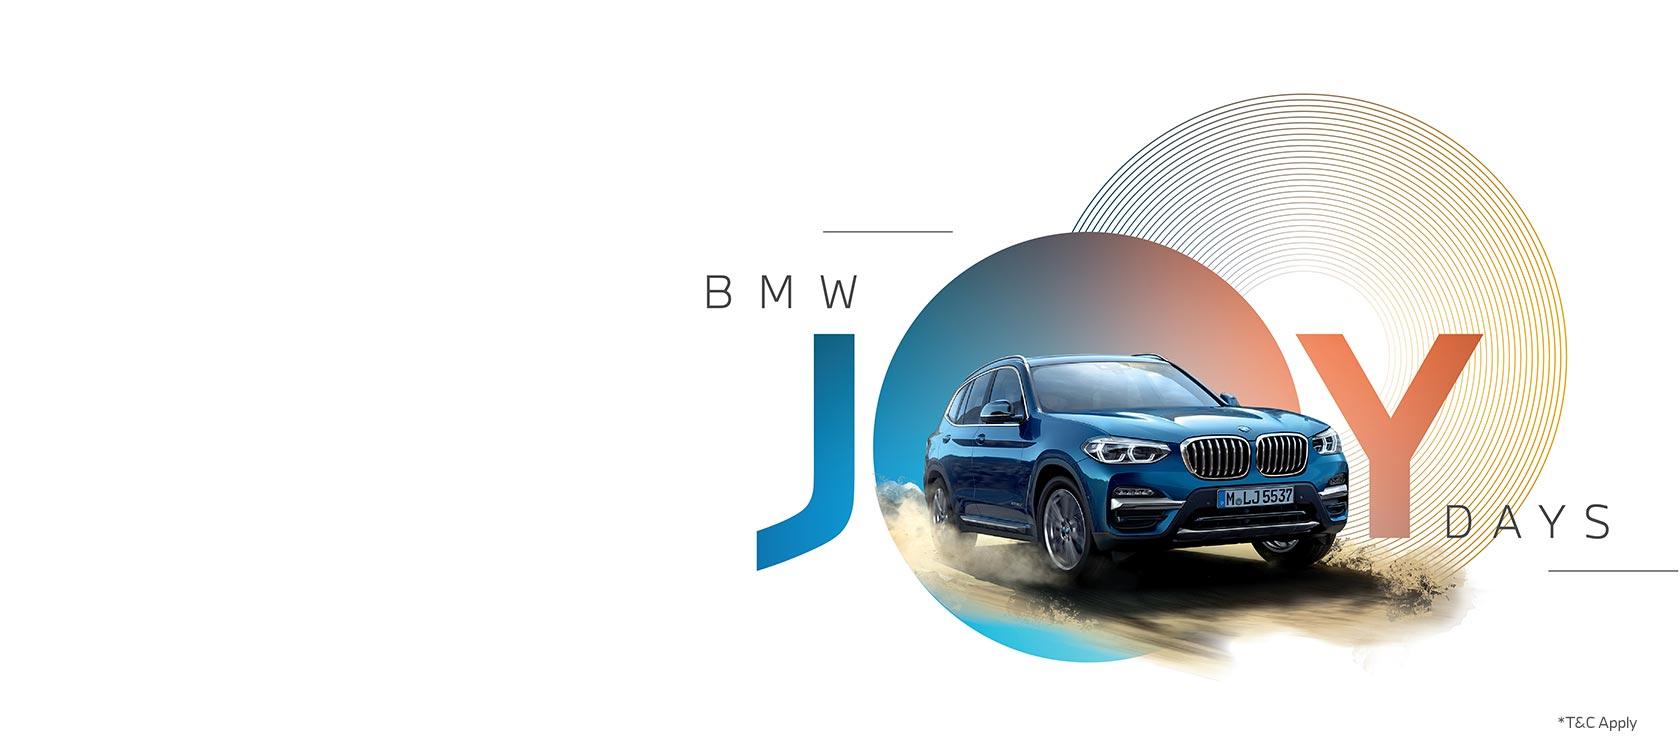 The BMW X3 SERIES